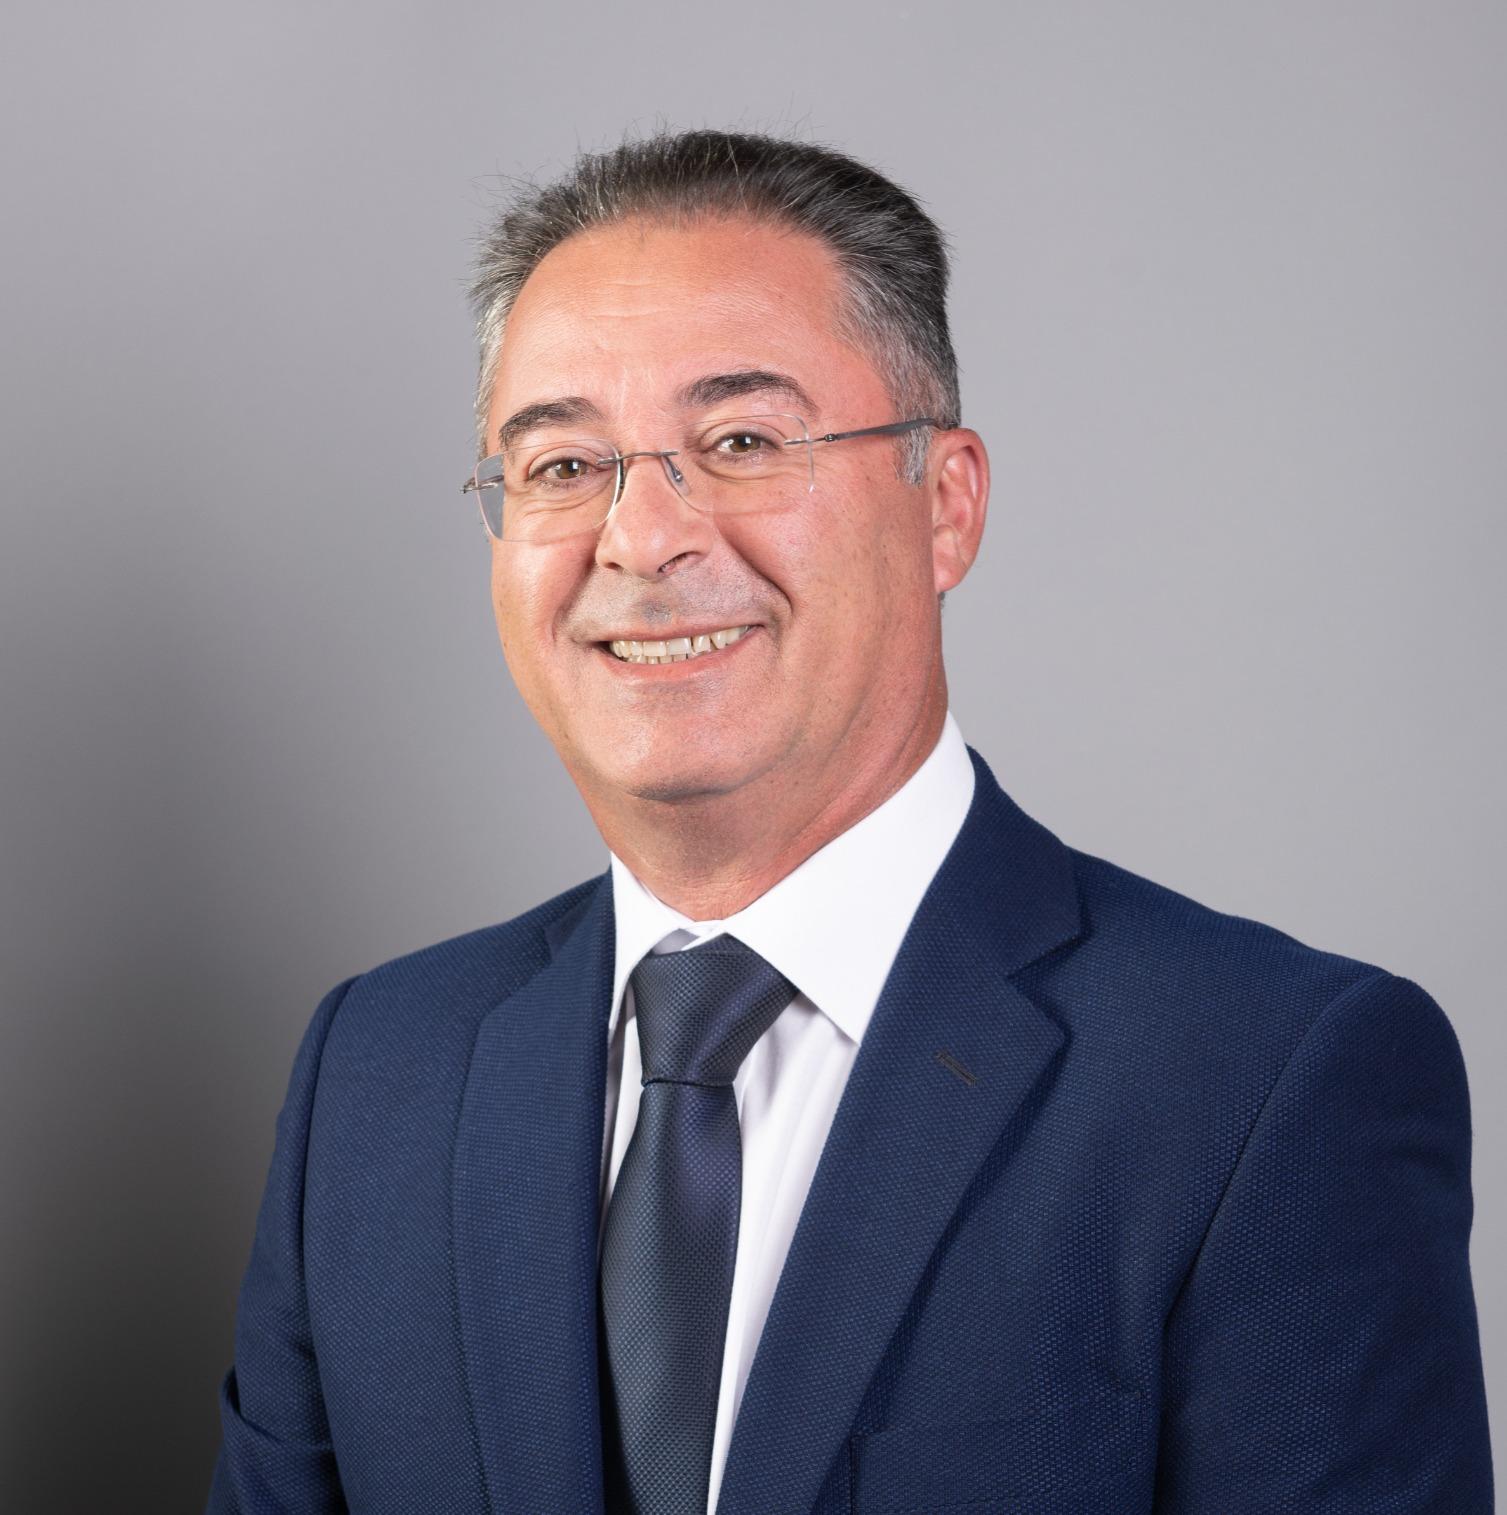 Carlos Antunes